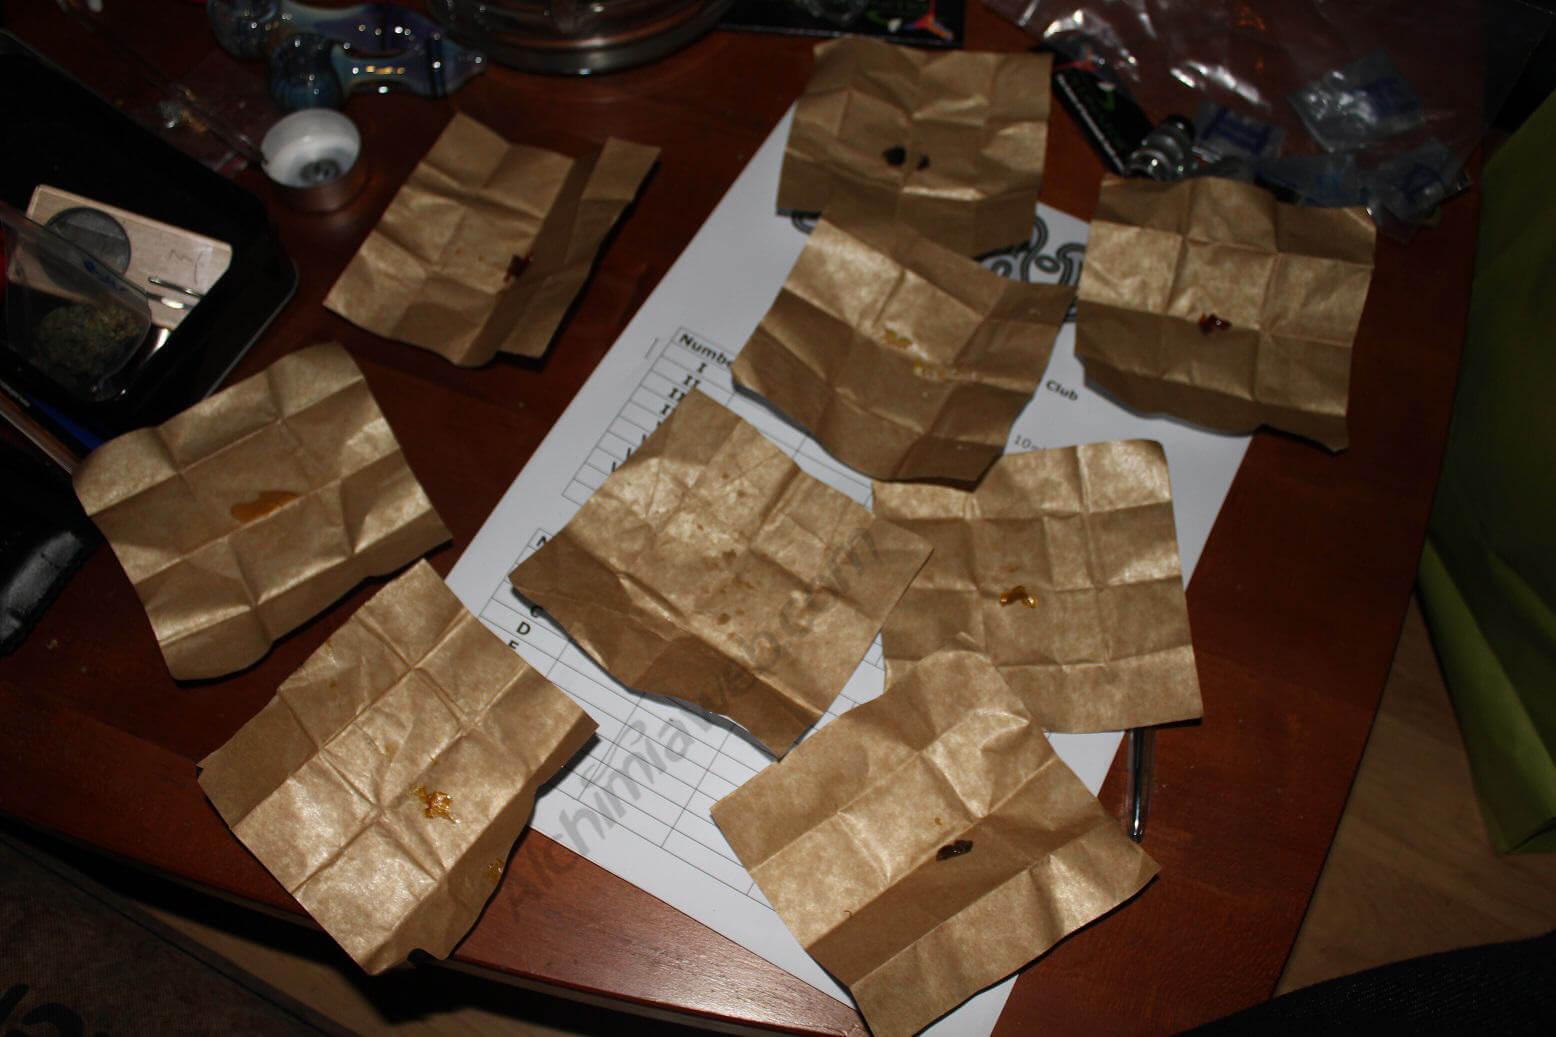 Diferentes muestras de resinas de marihuana extraídas con solvente.